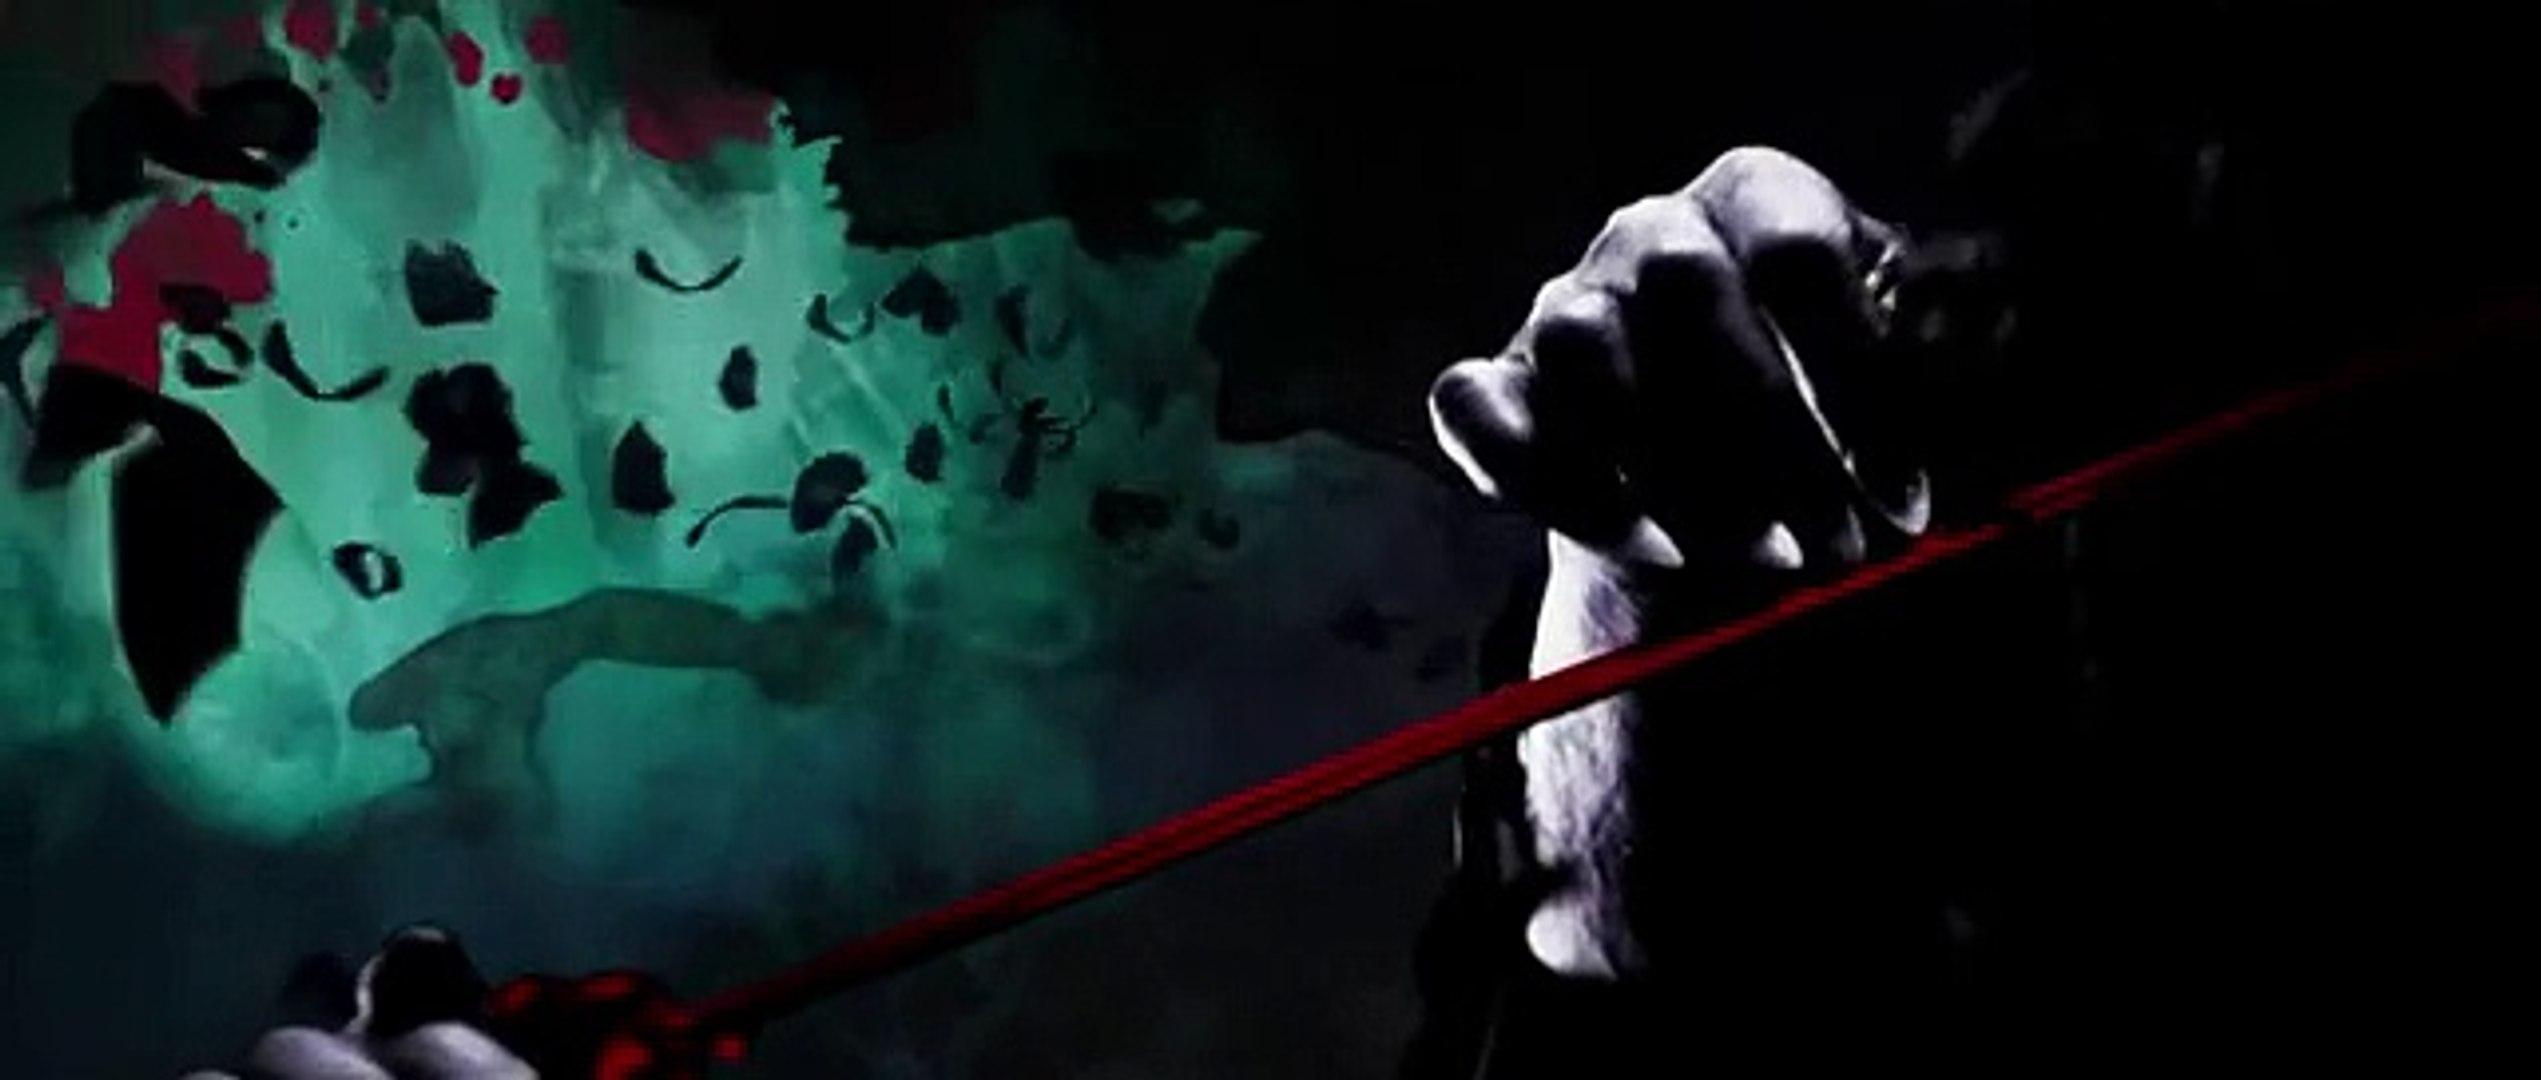 Dracula Untold Comic Trailer (2014) - Luke Evans Movie HD new action movies HD | english movi | acti